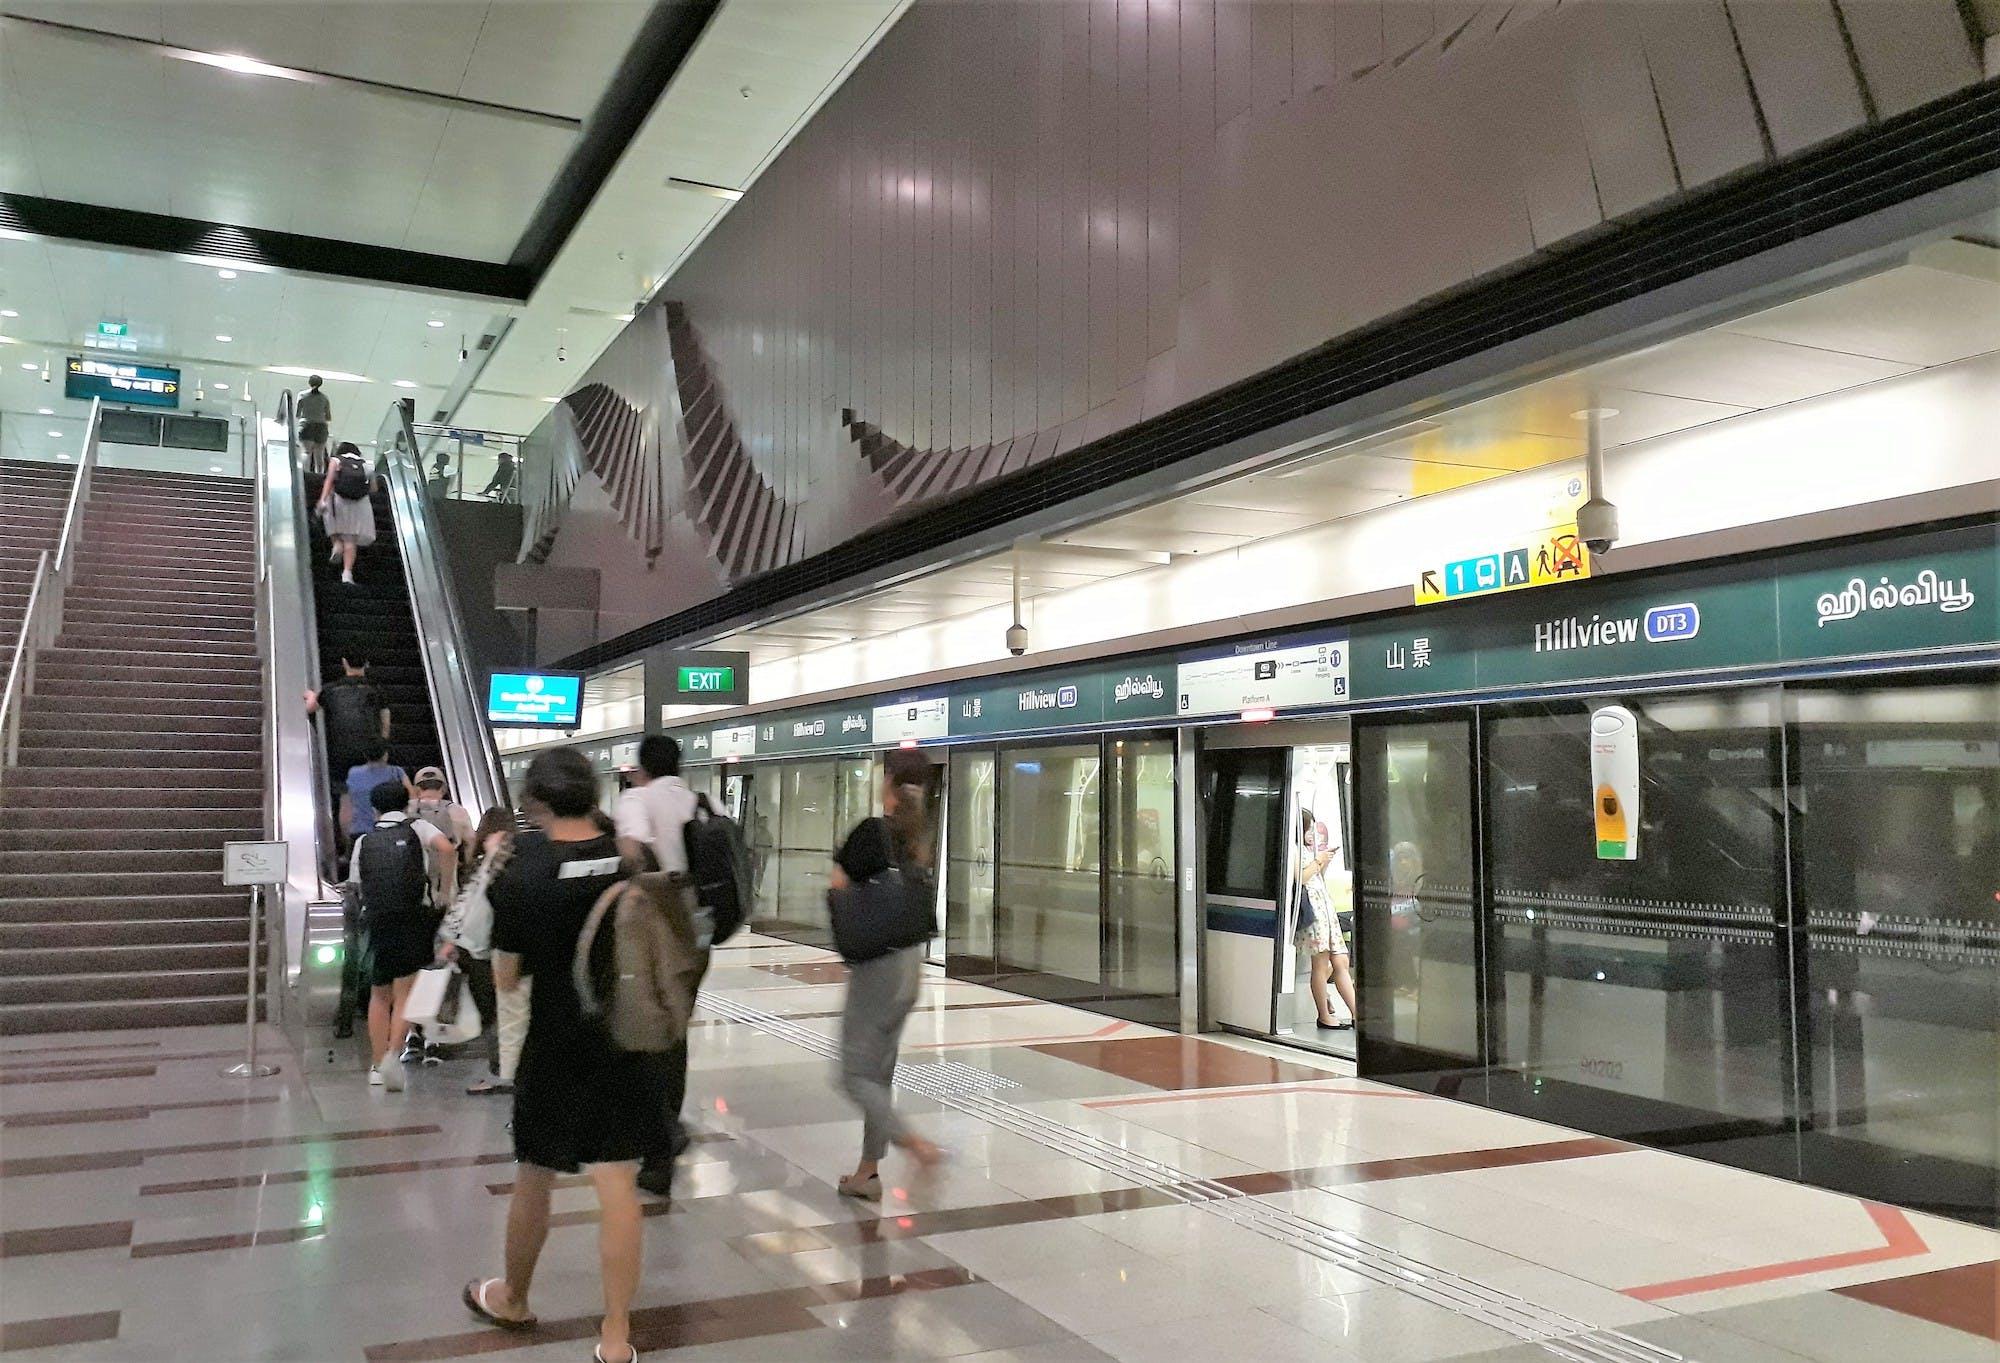 Hillview MRT Station platform